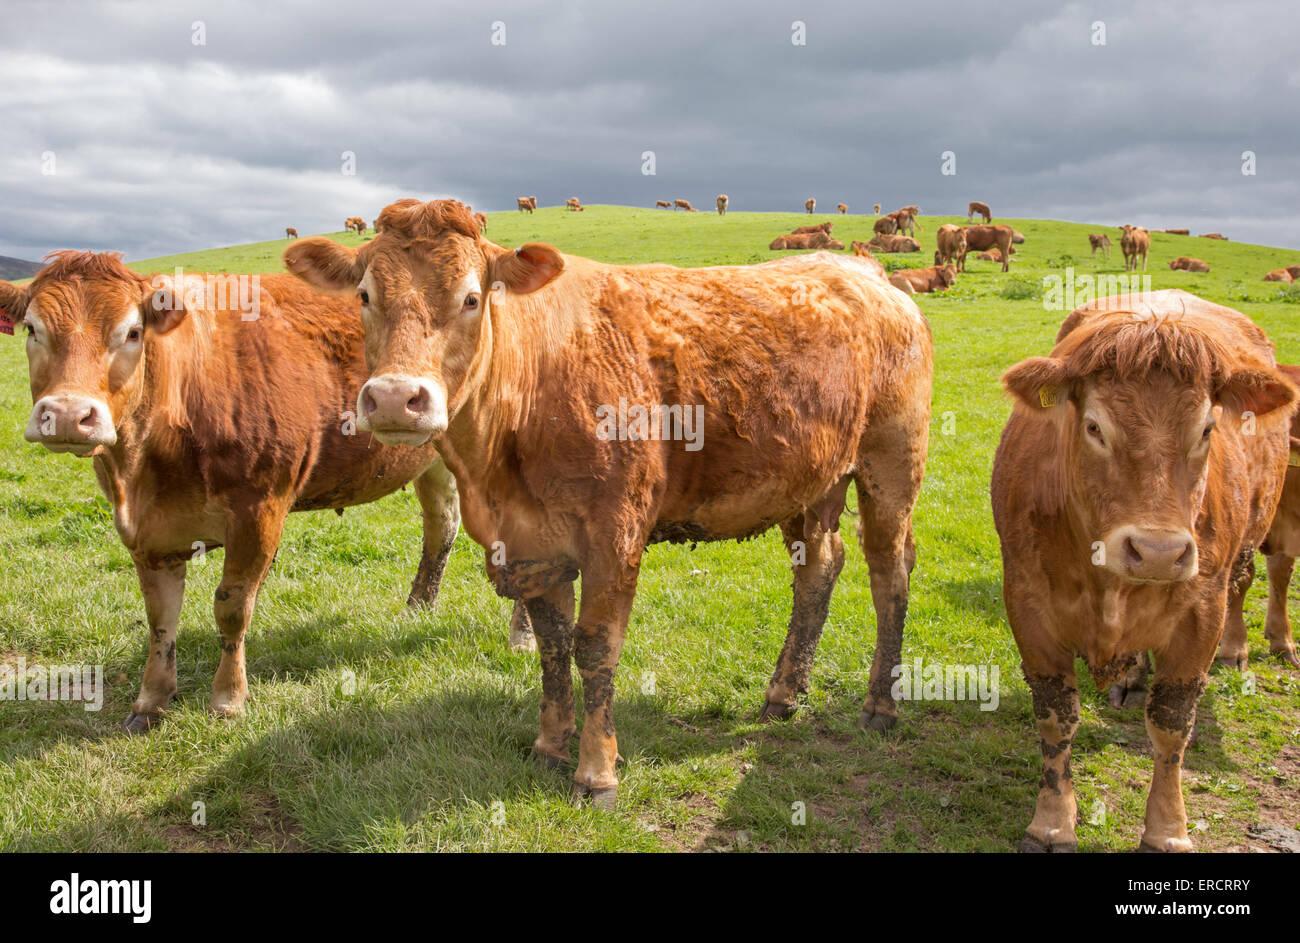 Red Ruby Devon Cattle, Shropshire, England, UK - Stock Image